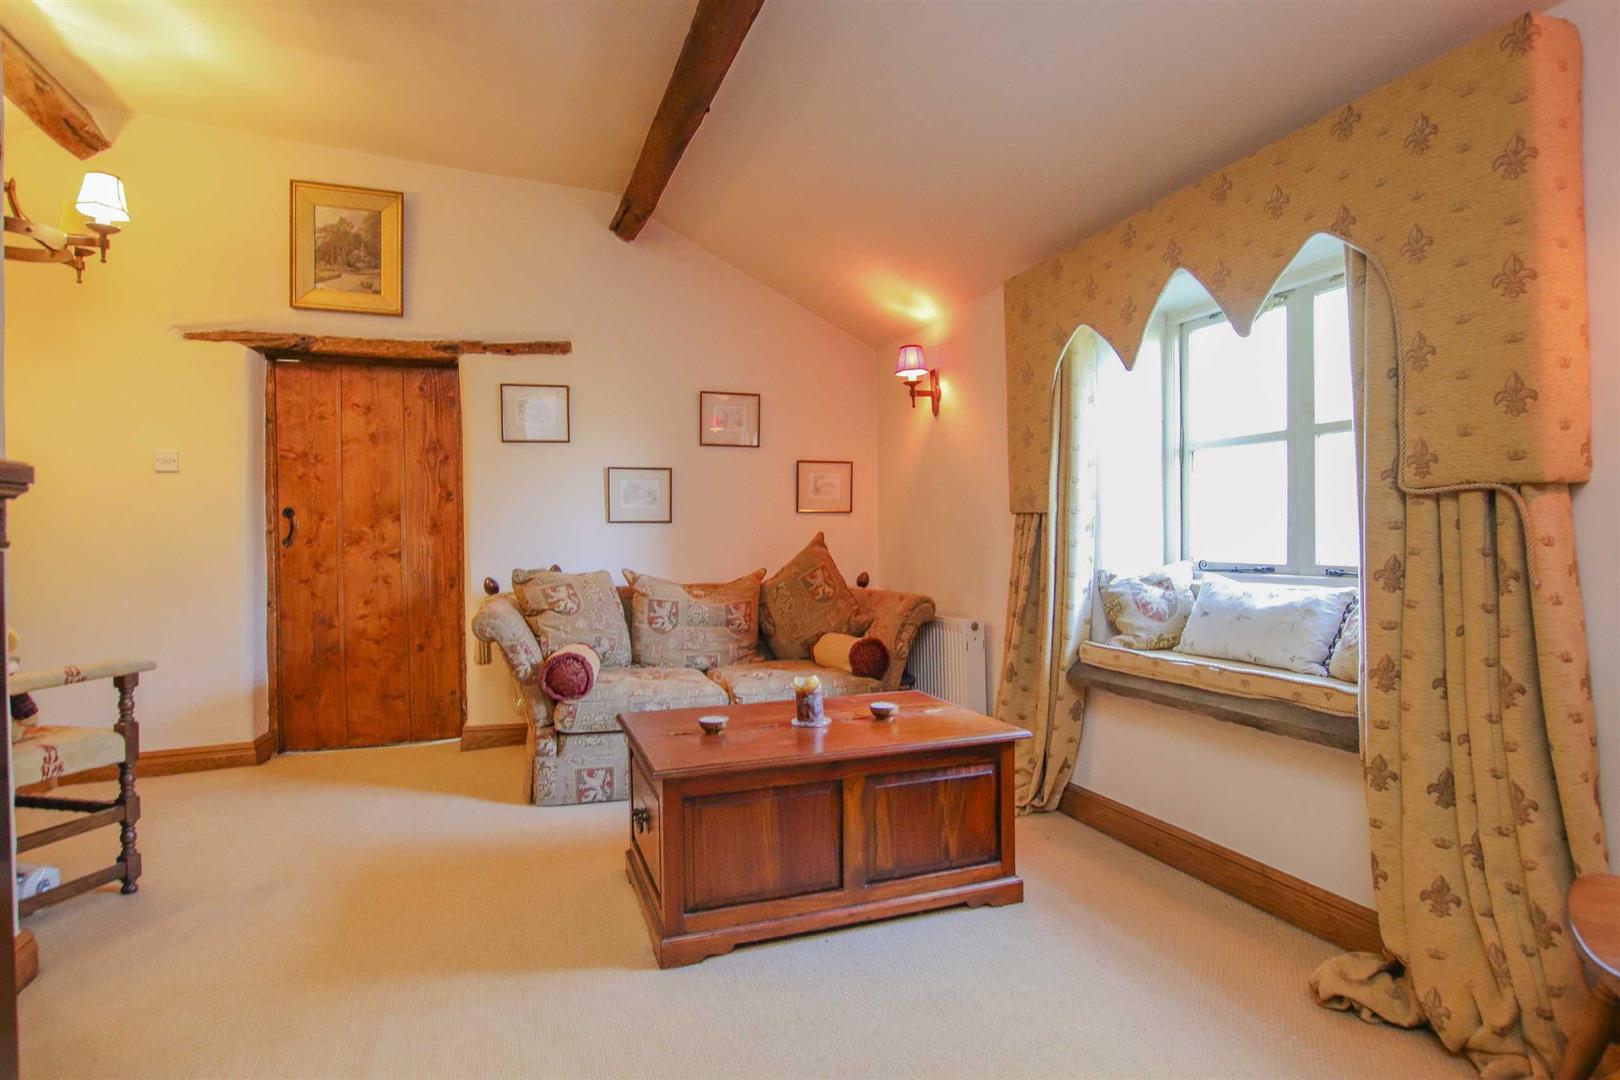 3 Bedroom Semi-detached House For Sale - p038856_07.jpg